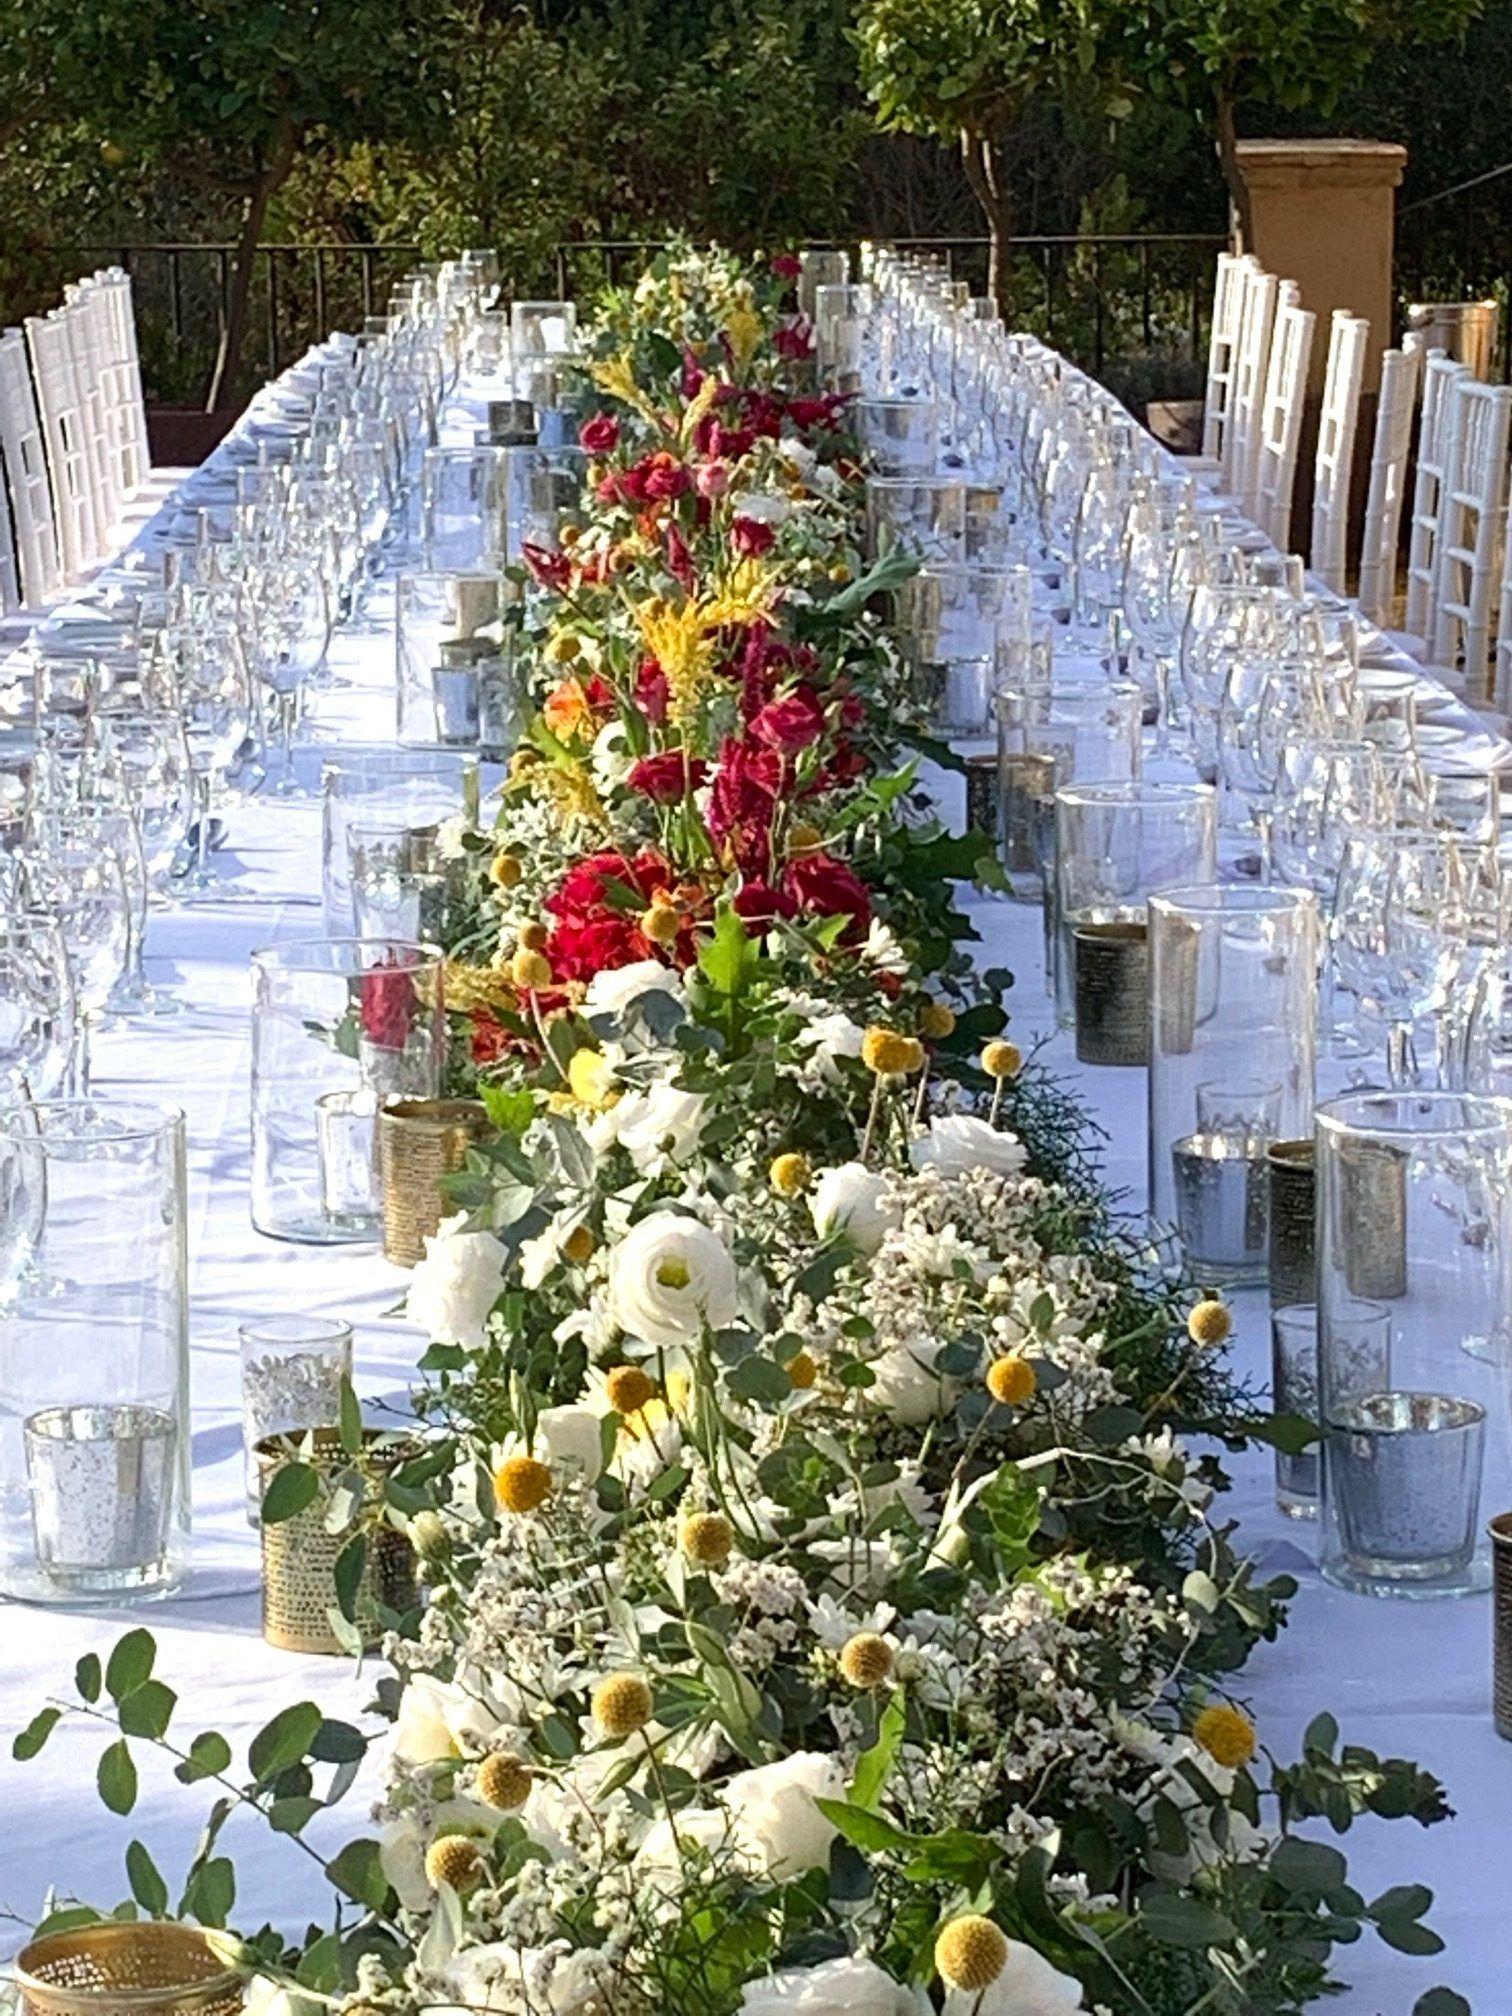 Wedding-Season-around-the-corner-Florium-Sotogrande-Flower-Shop-Cádiz-Spain 18